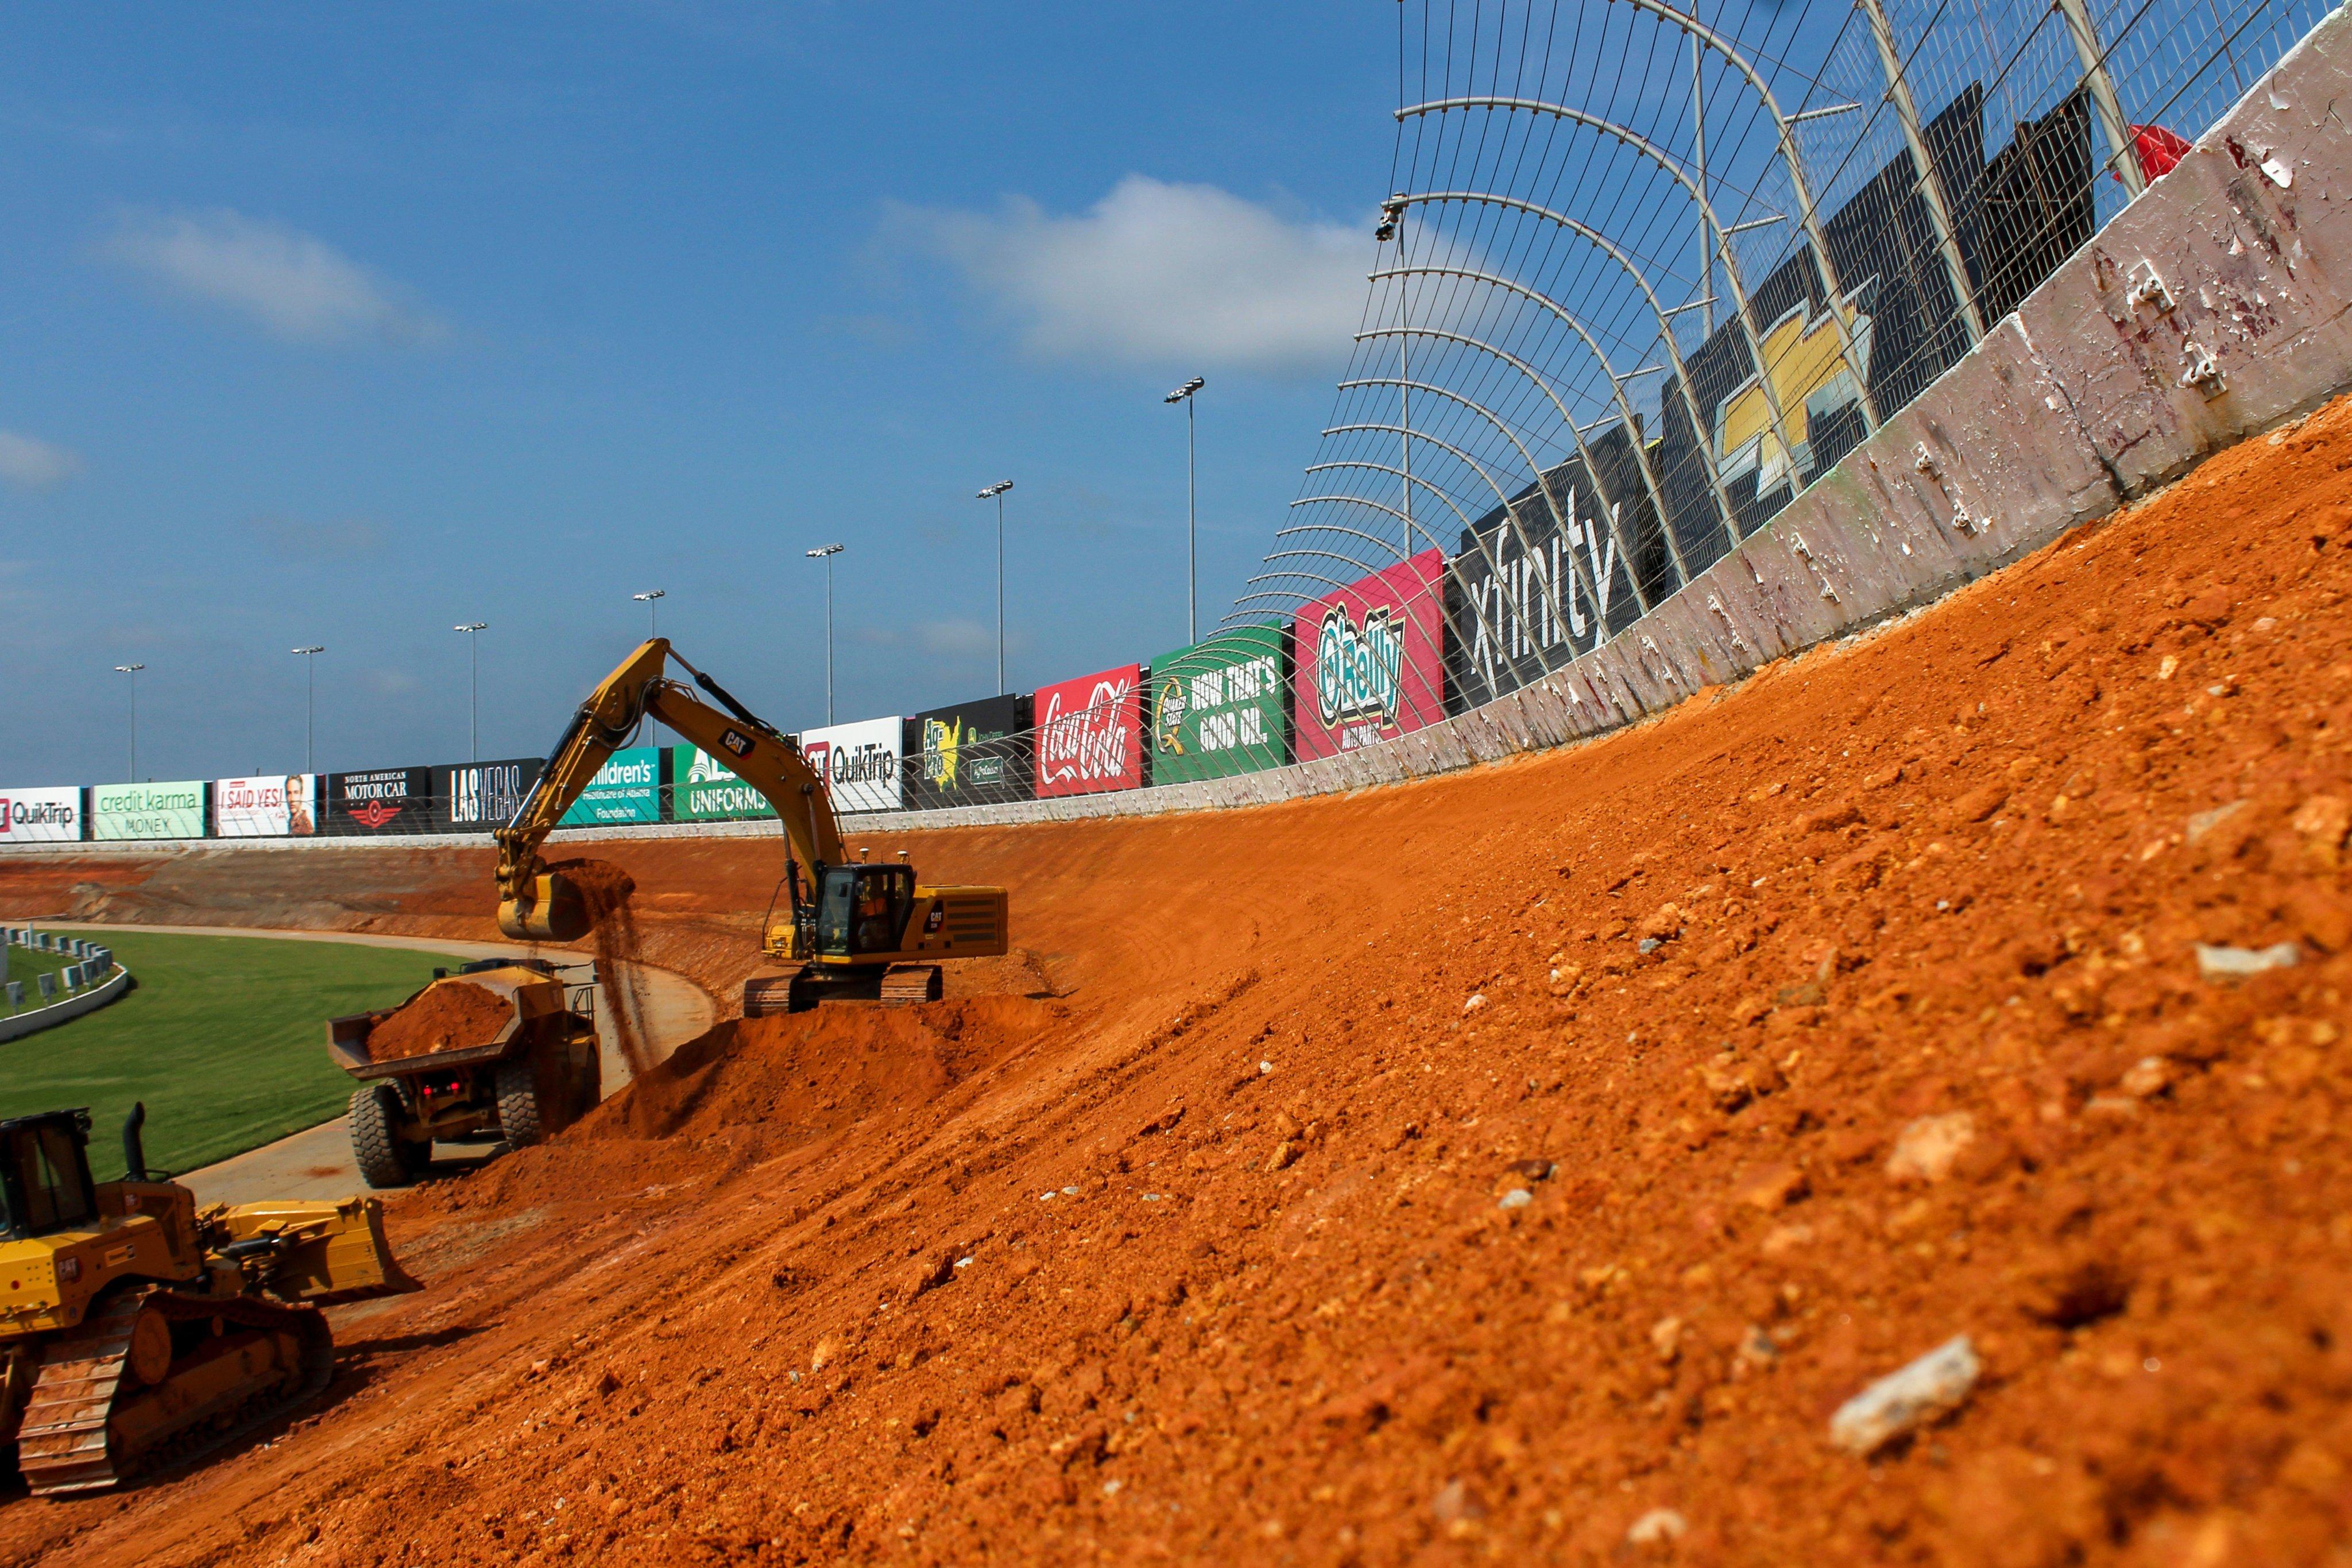 New Atlanta Motor Speedway banking construction - 28 degrees